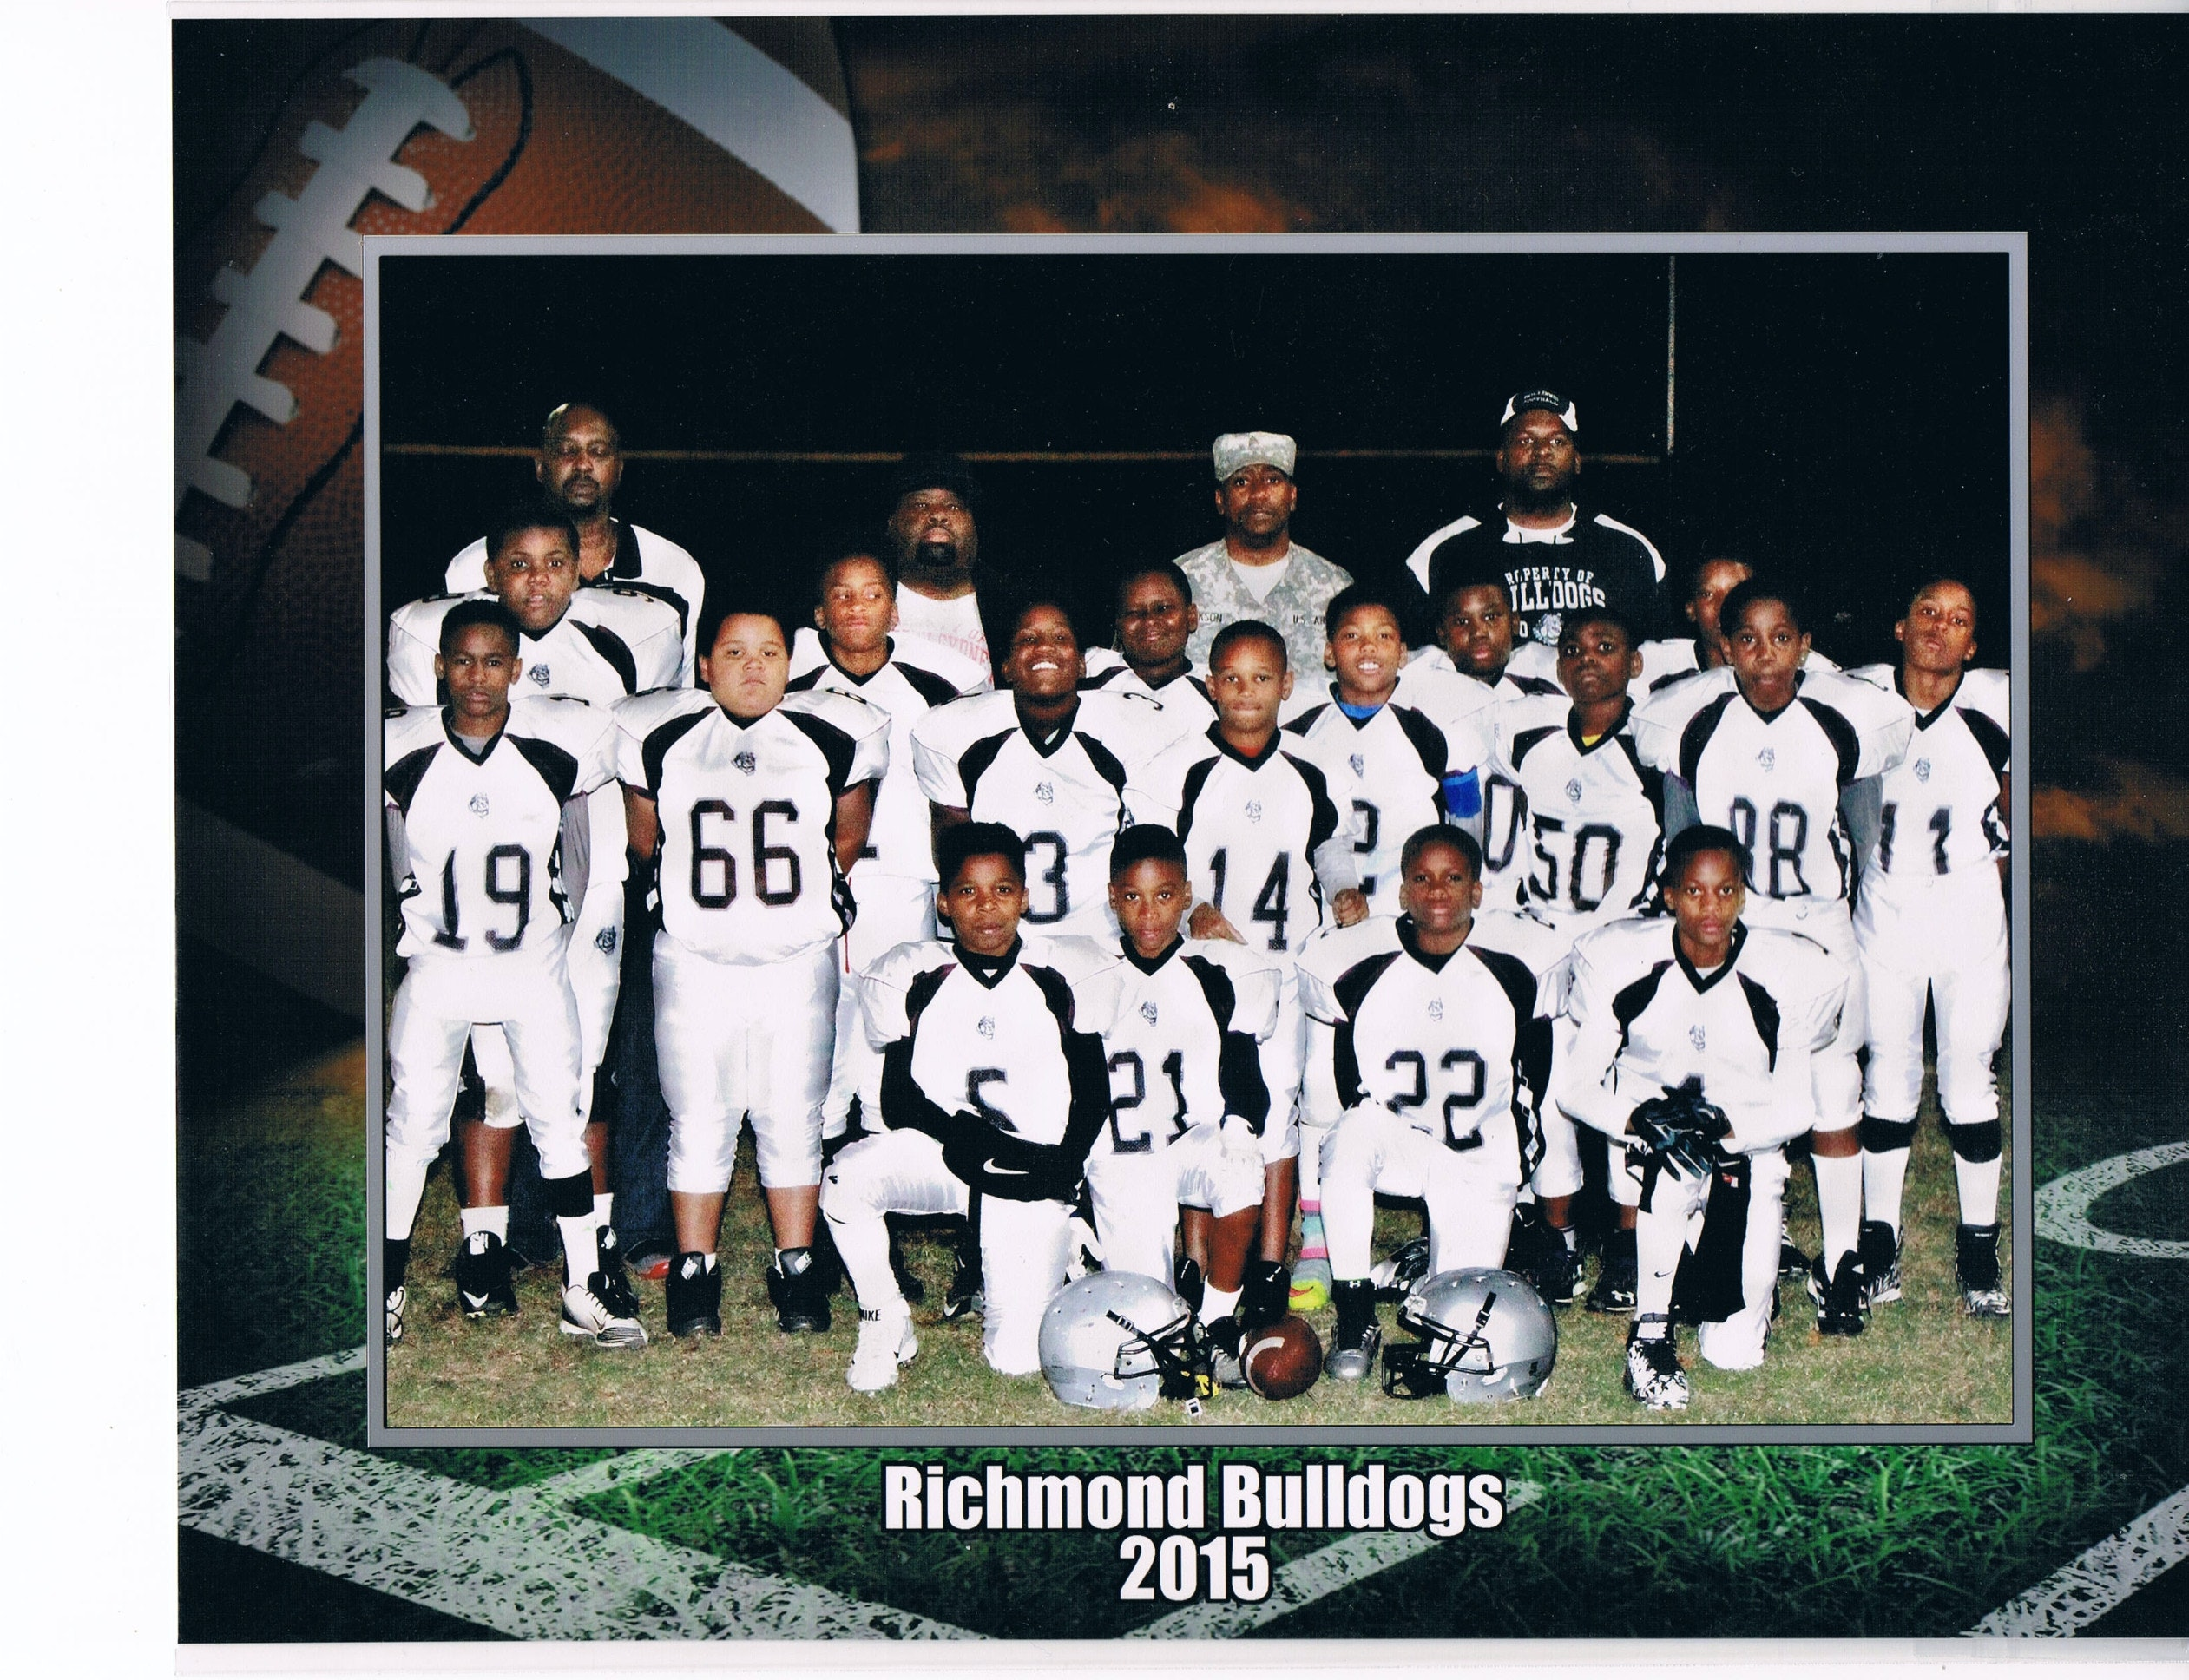 Richmond Bulldogs